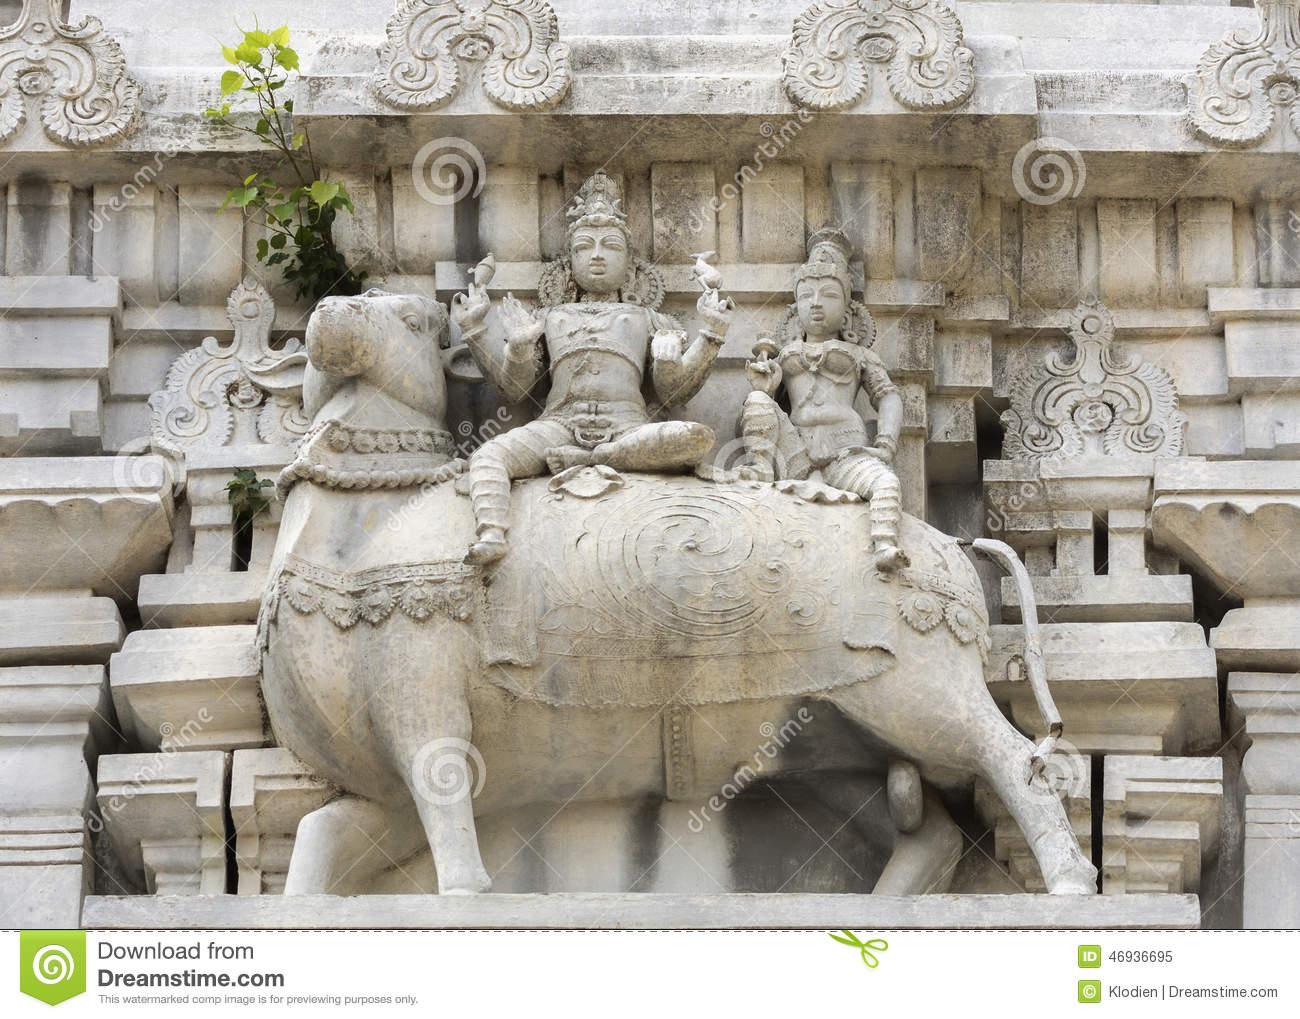 Statue Of Nandi The Bull At Thiruvannamalai Temple. Stock Photo.